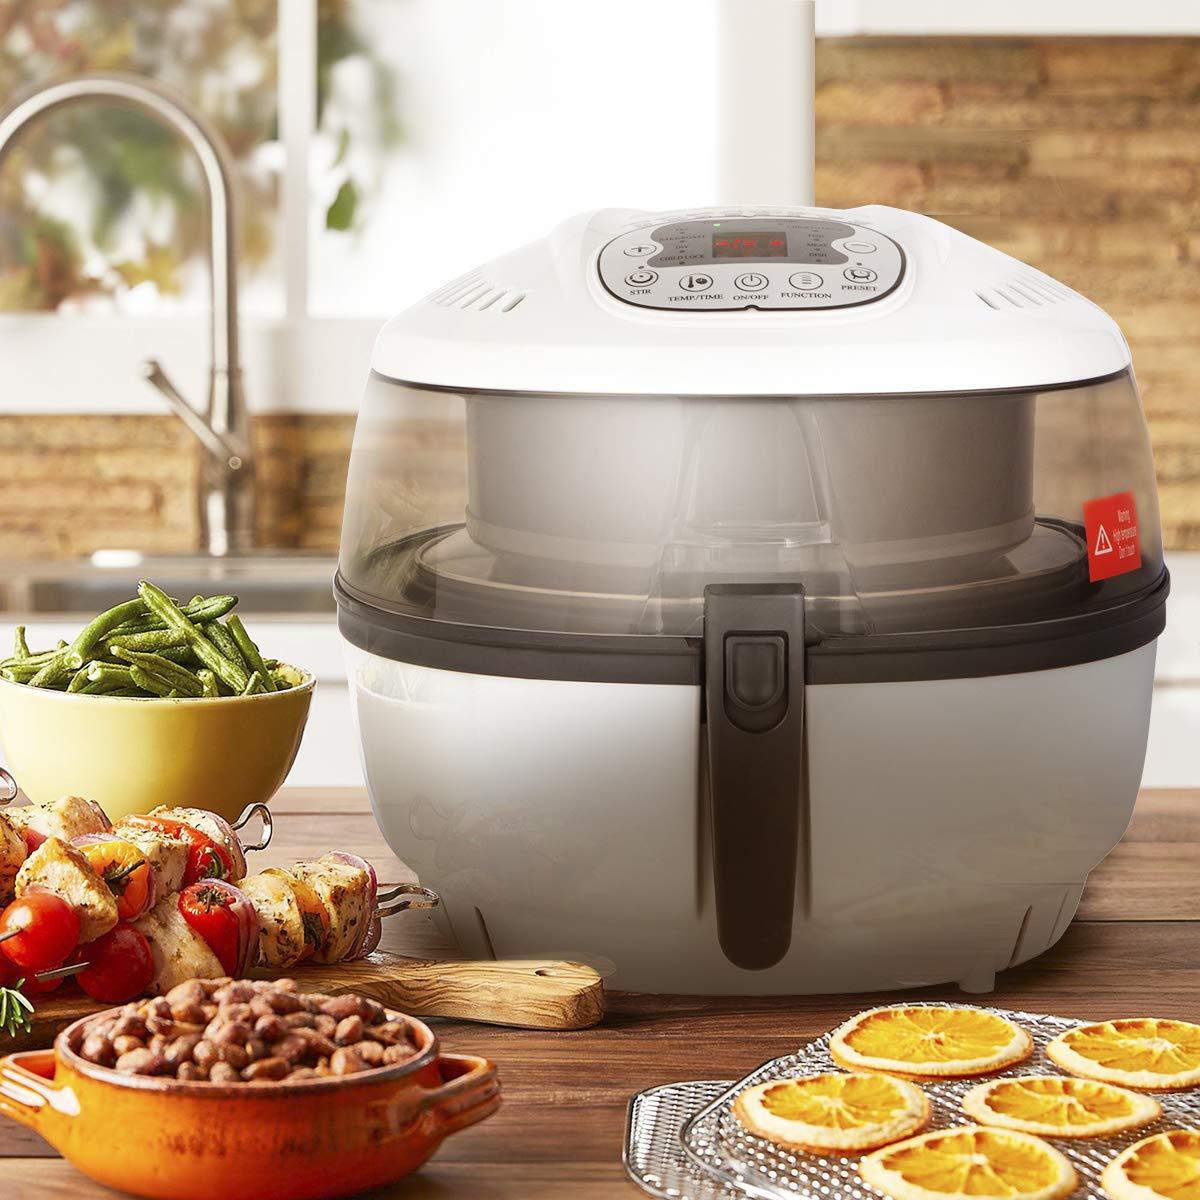 Ensue Premium Electric Air Fryer Oil-free Fry Cooker No Oil Digital Temperature Timer Control Stir Function, 1700 Watts, 6.3QT